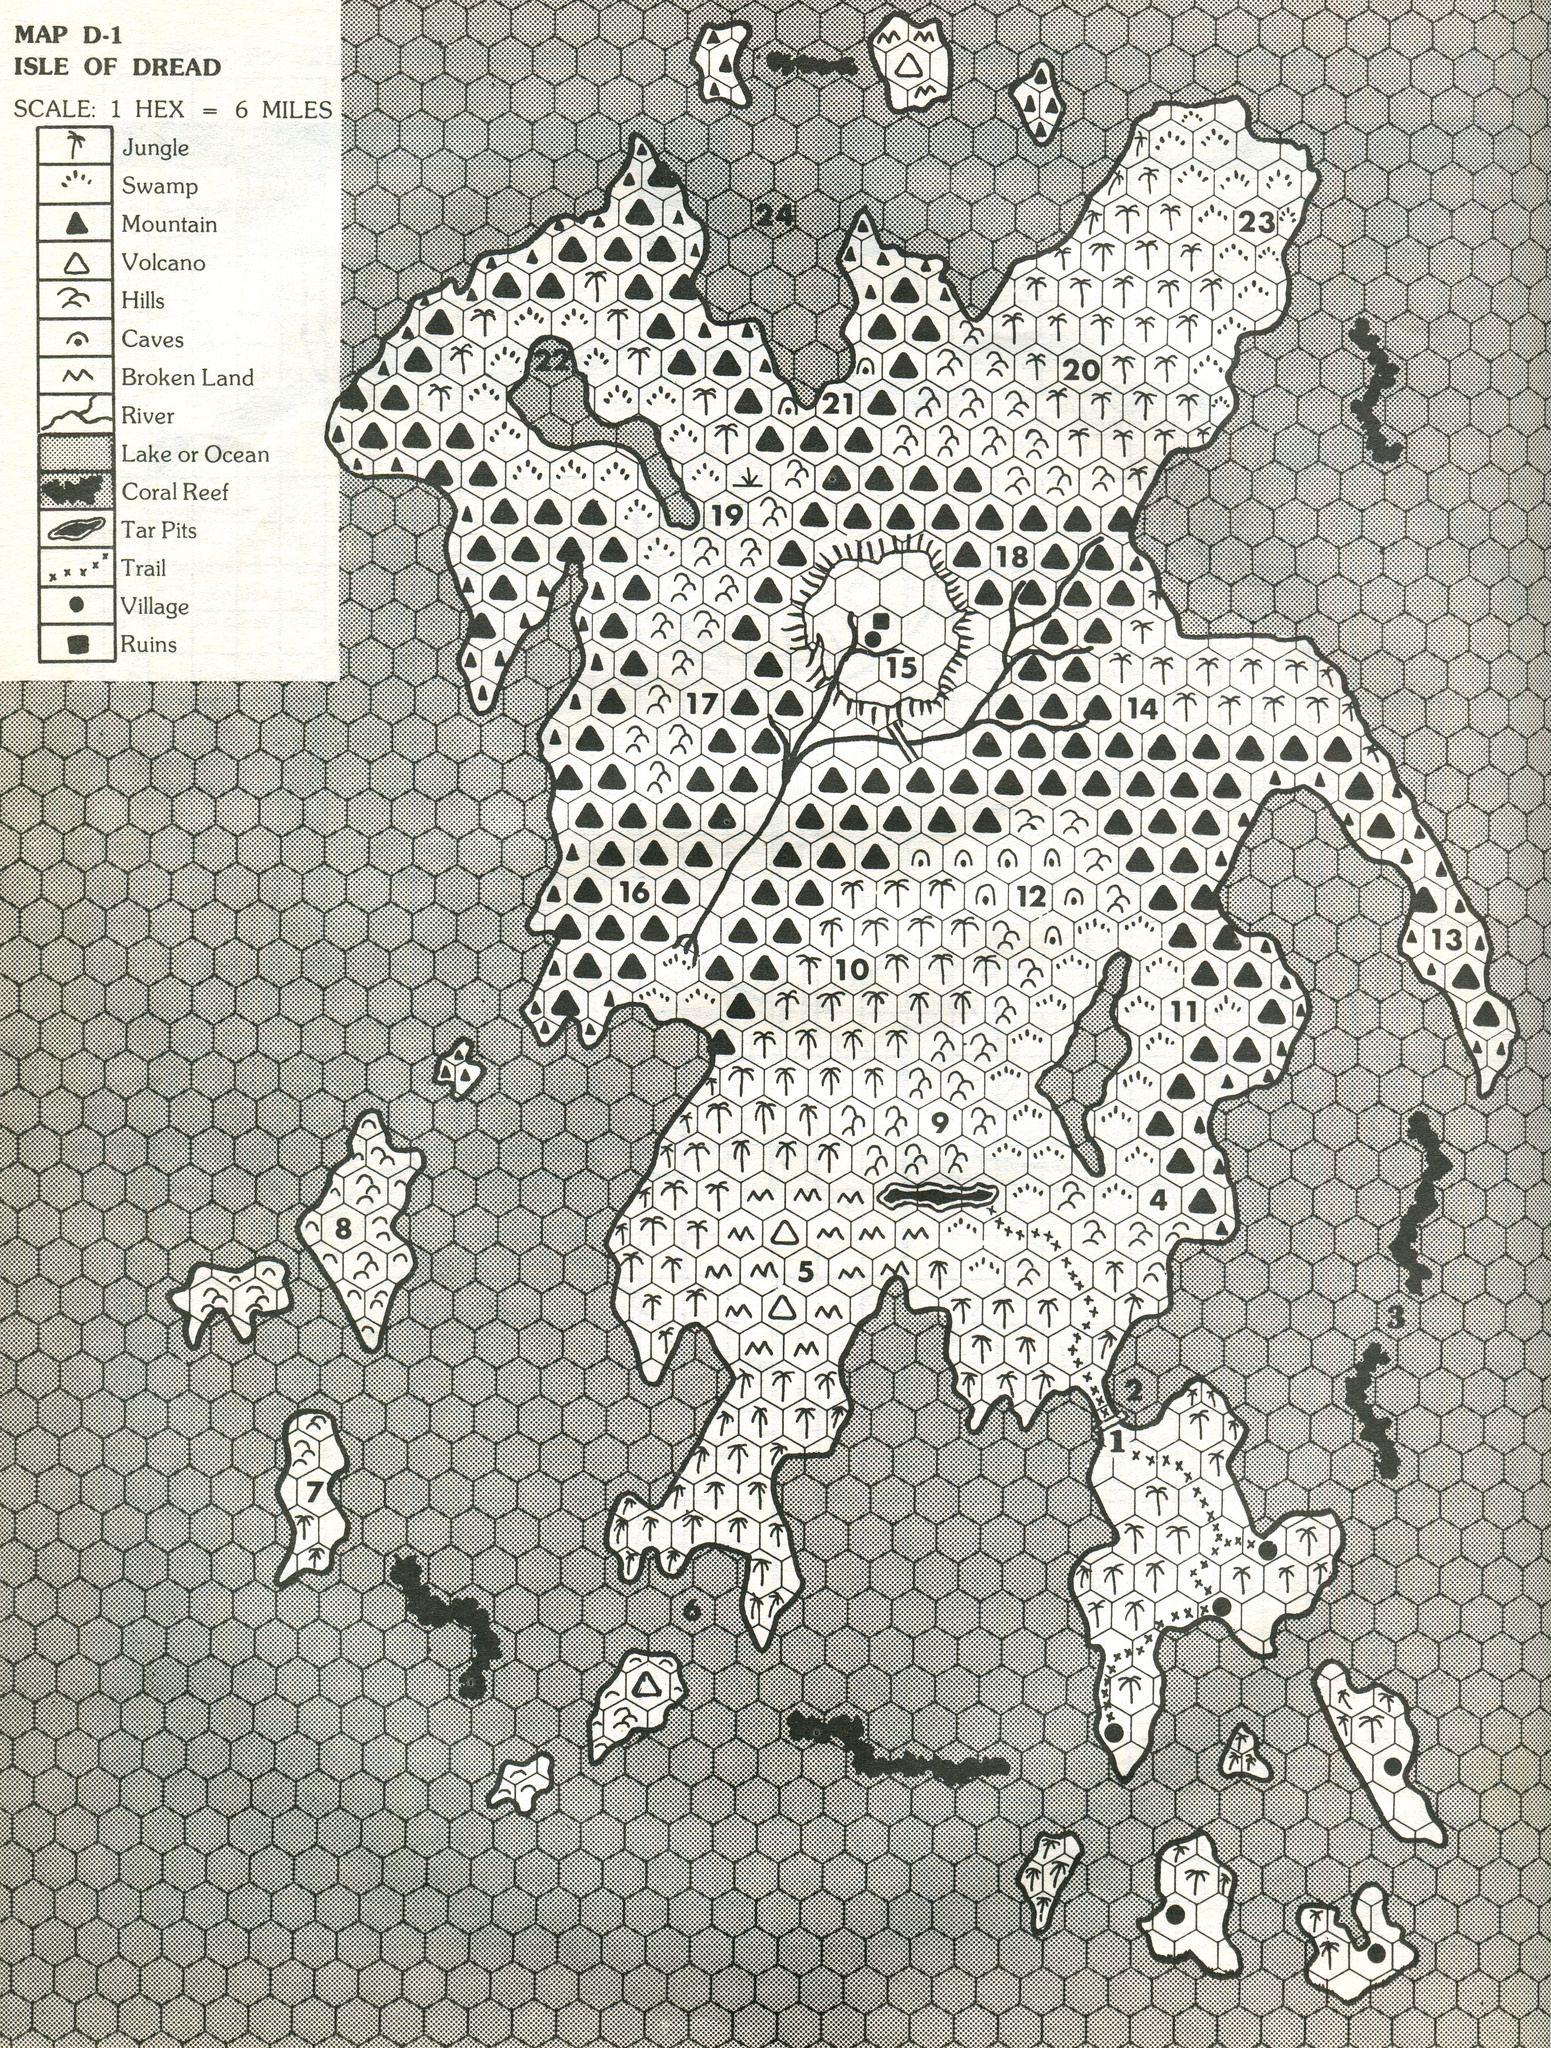 Isle of Dread Hex Map